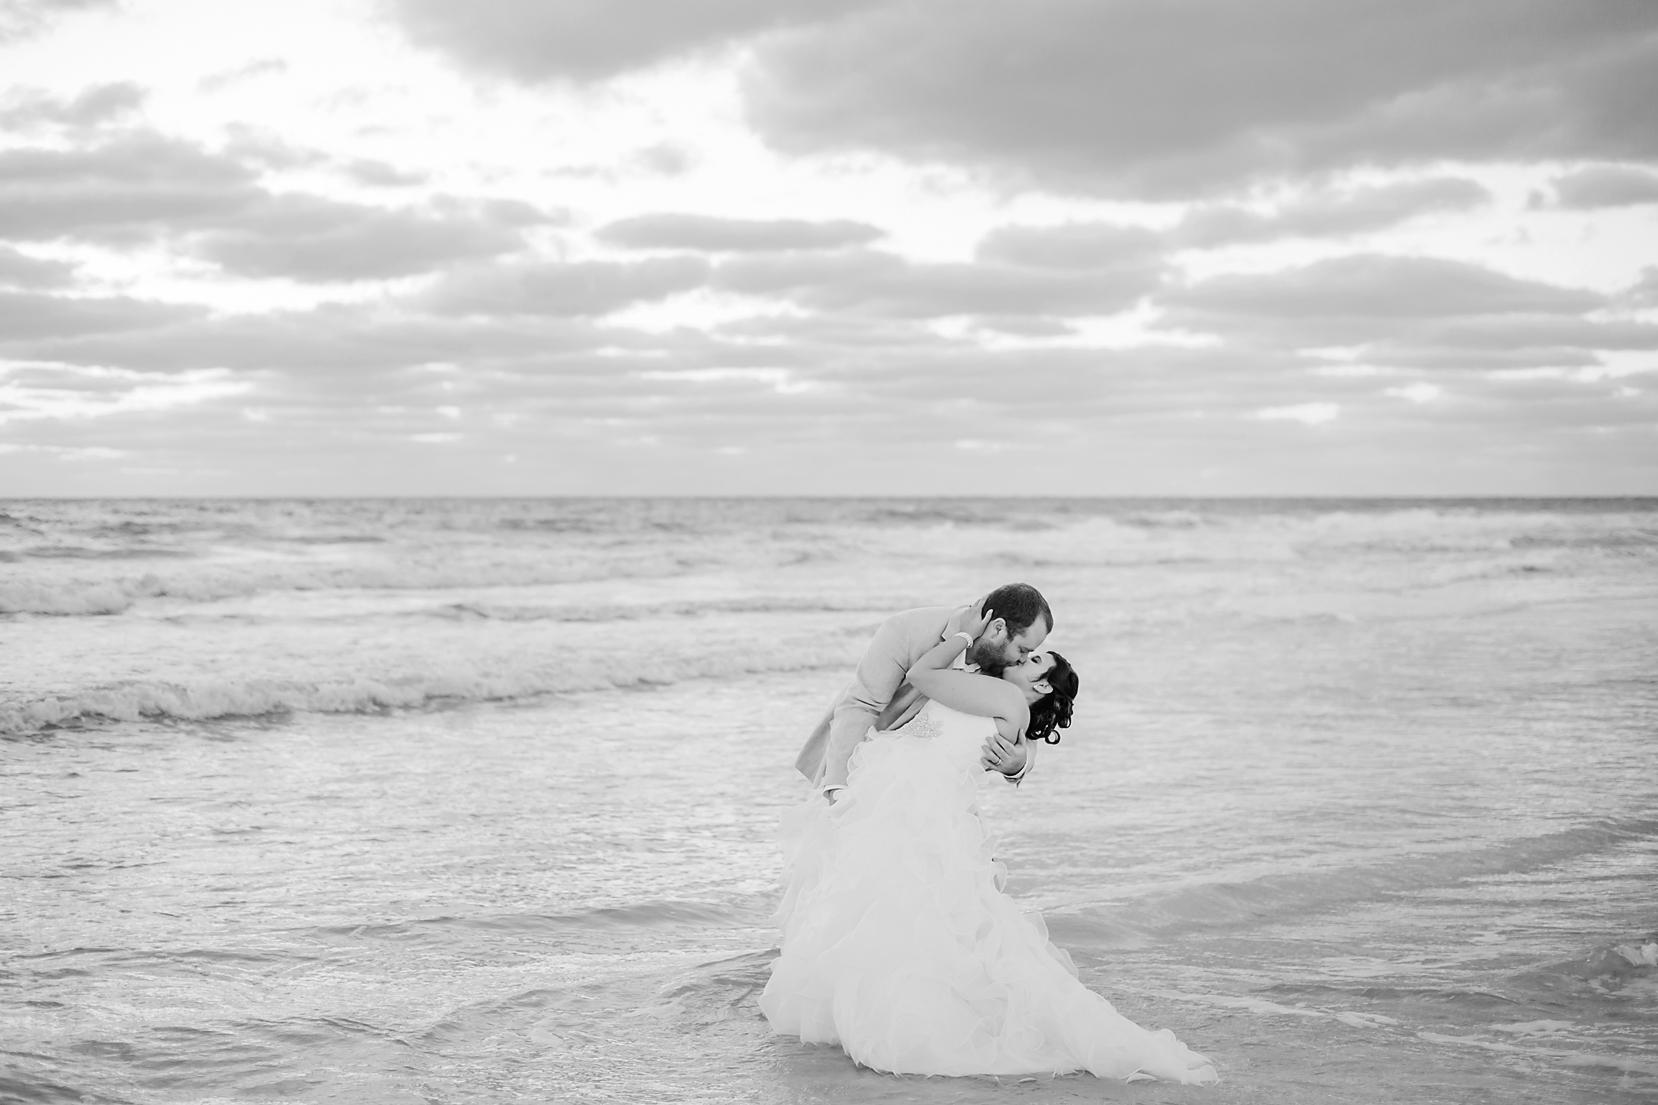 Bailey + Chalin - Anna Maria Island Wedding Photographer - Destination Wedding Photography - Emily & Co. Photography - Beach Wedding Photography 199 b.jpg